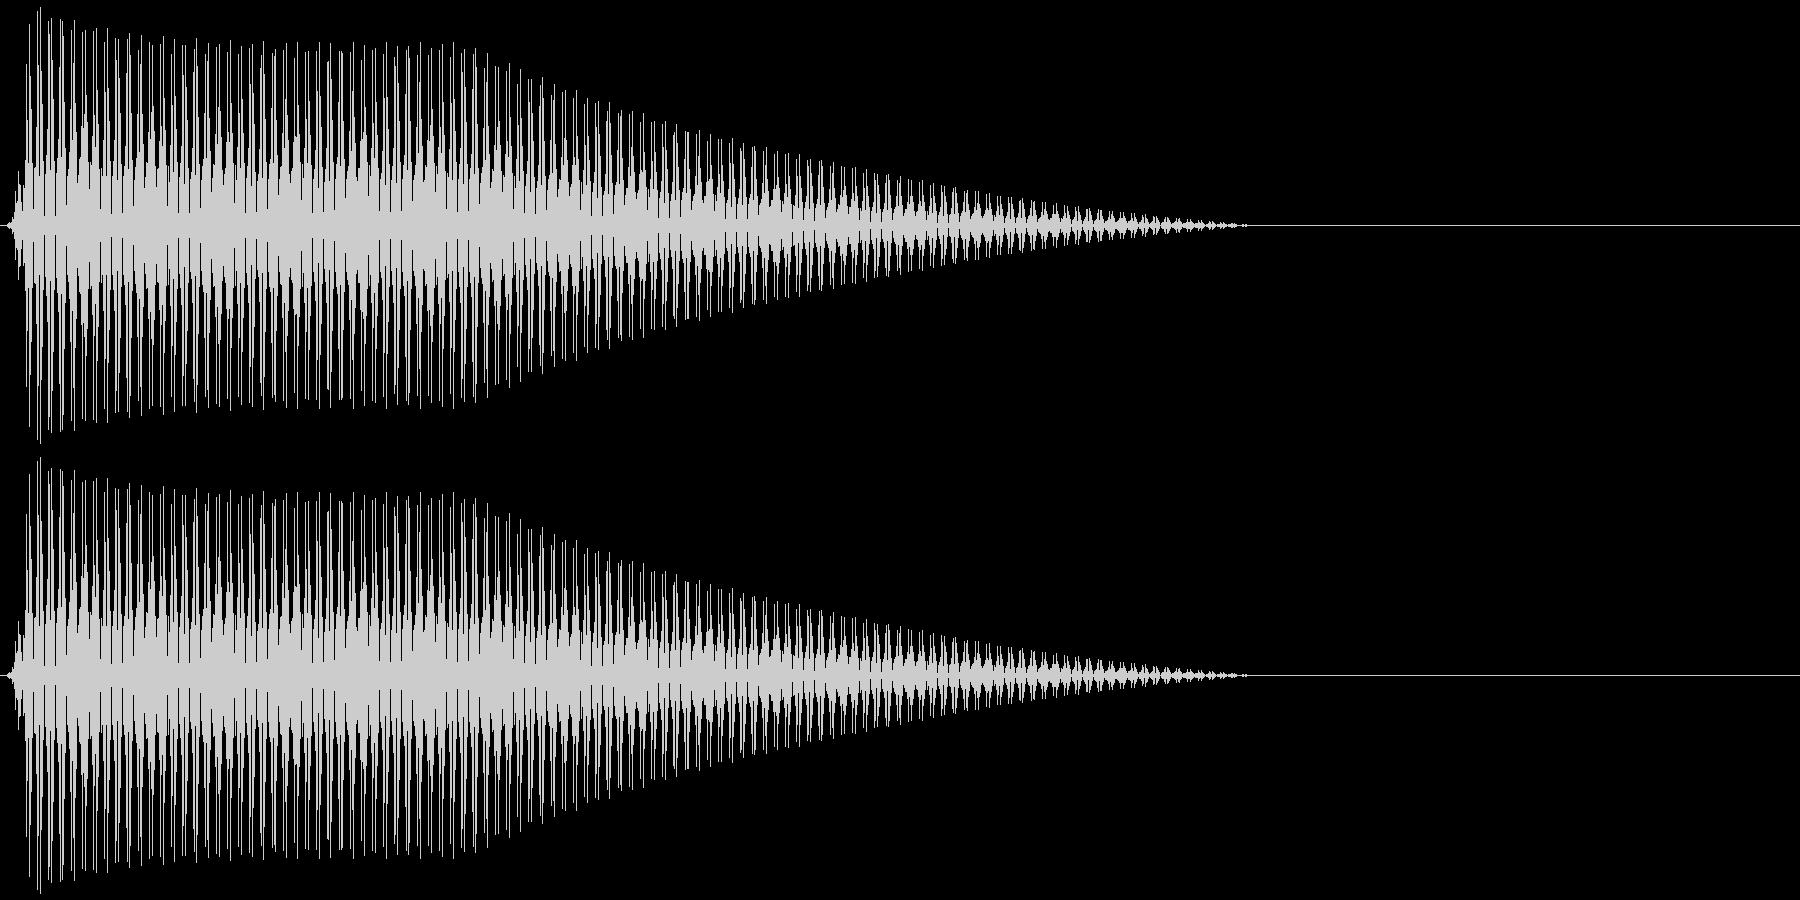 OctaveCom アプリ用タッチ音12の未再生の波形